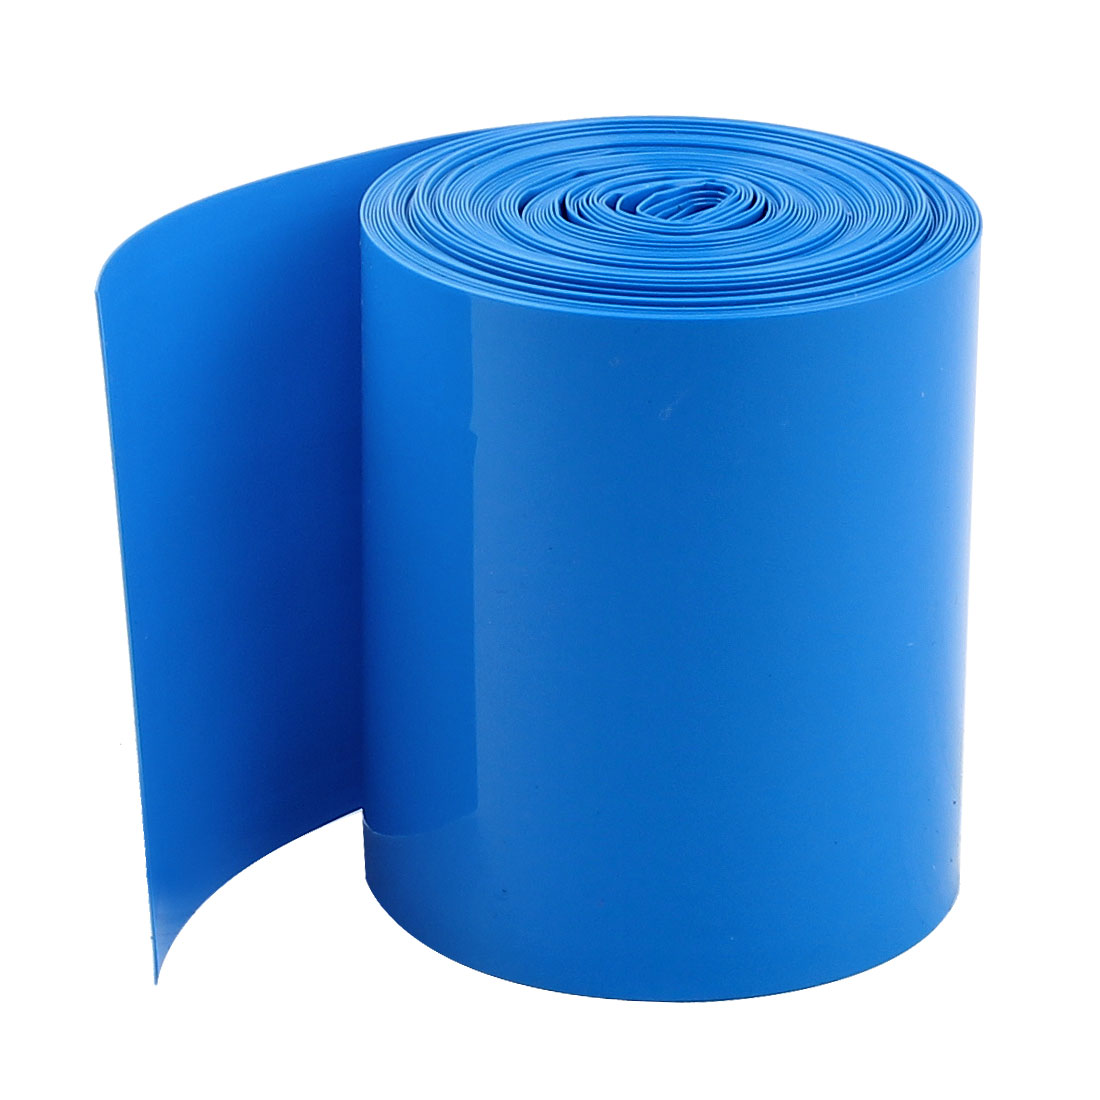 uxcell 5meters 50mm width pvc heat shrink wrap tube blue. Black Bedroom Furniture Sets. Home Design Ideas